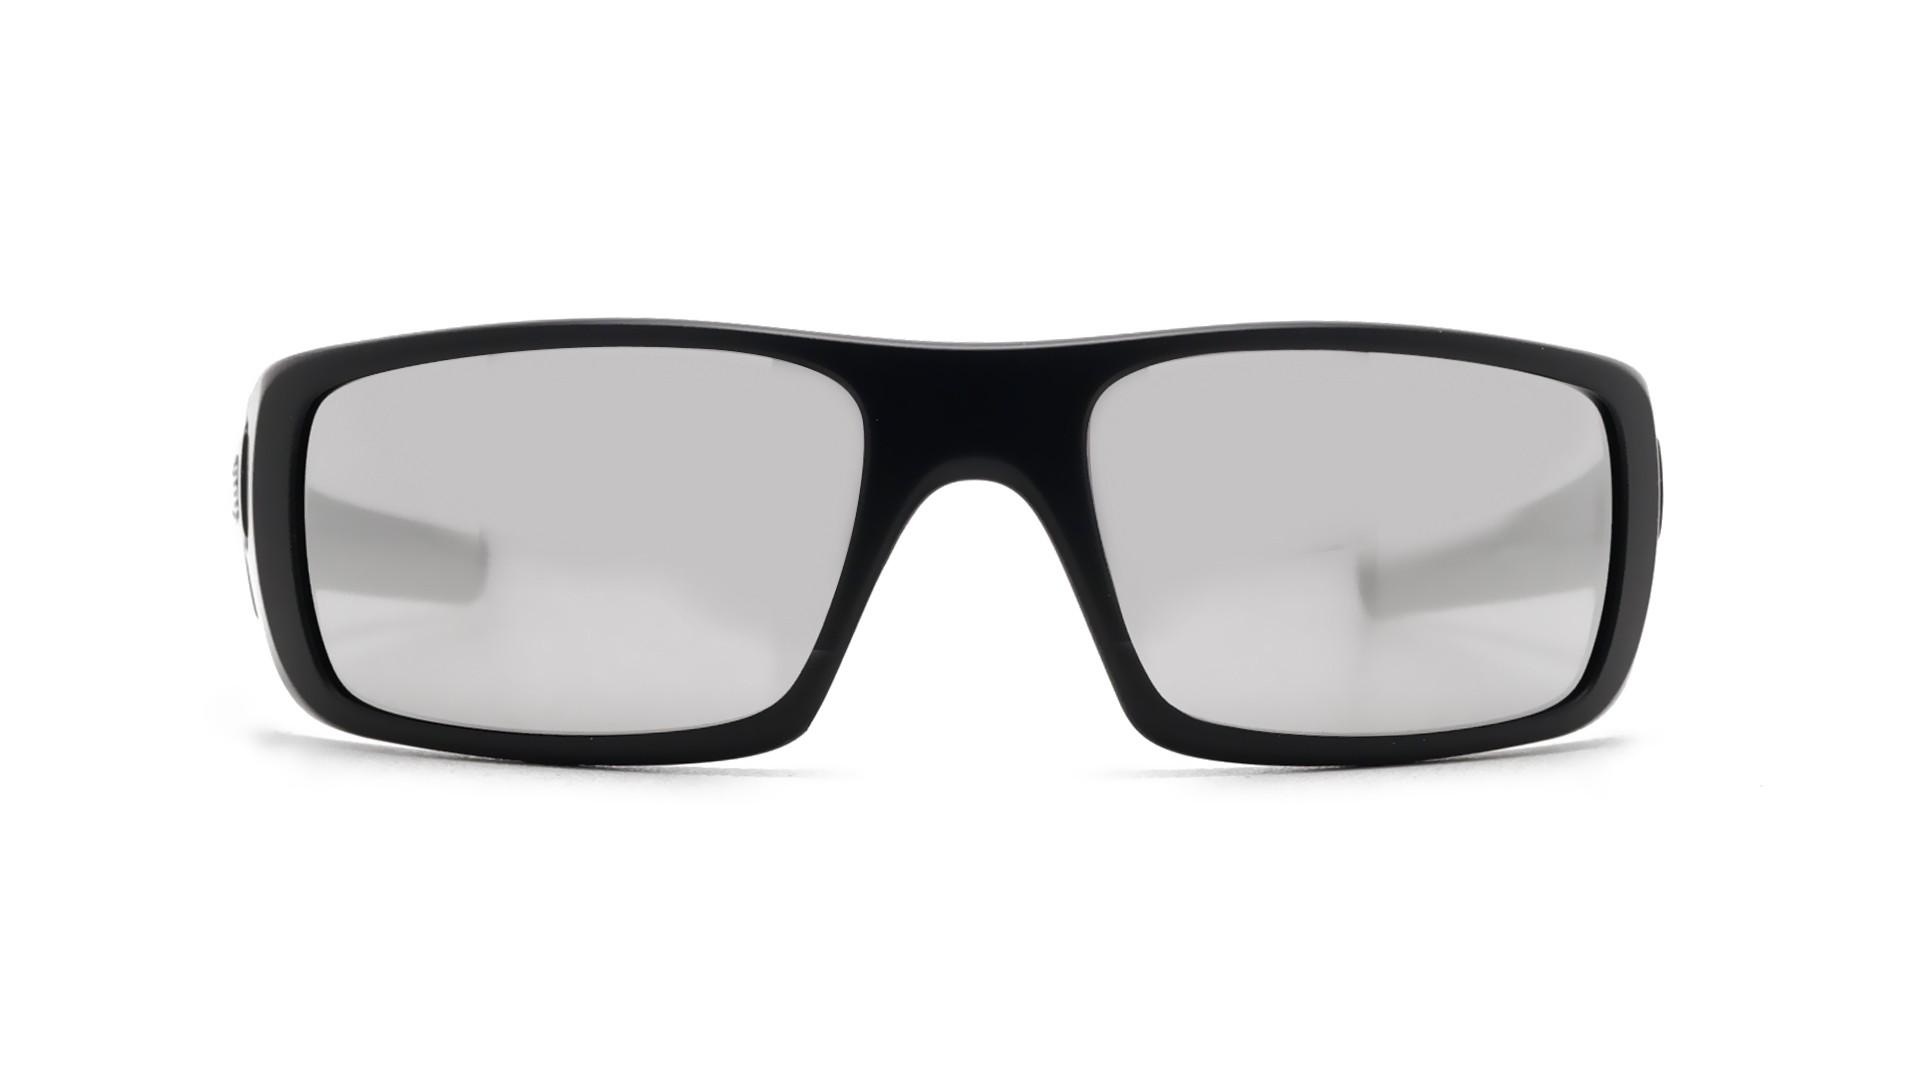 195b3bfb087 Sunglasses Oakley Crankshaft Black Mat OO9239 20 60-19 Medium Flash